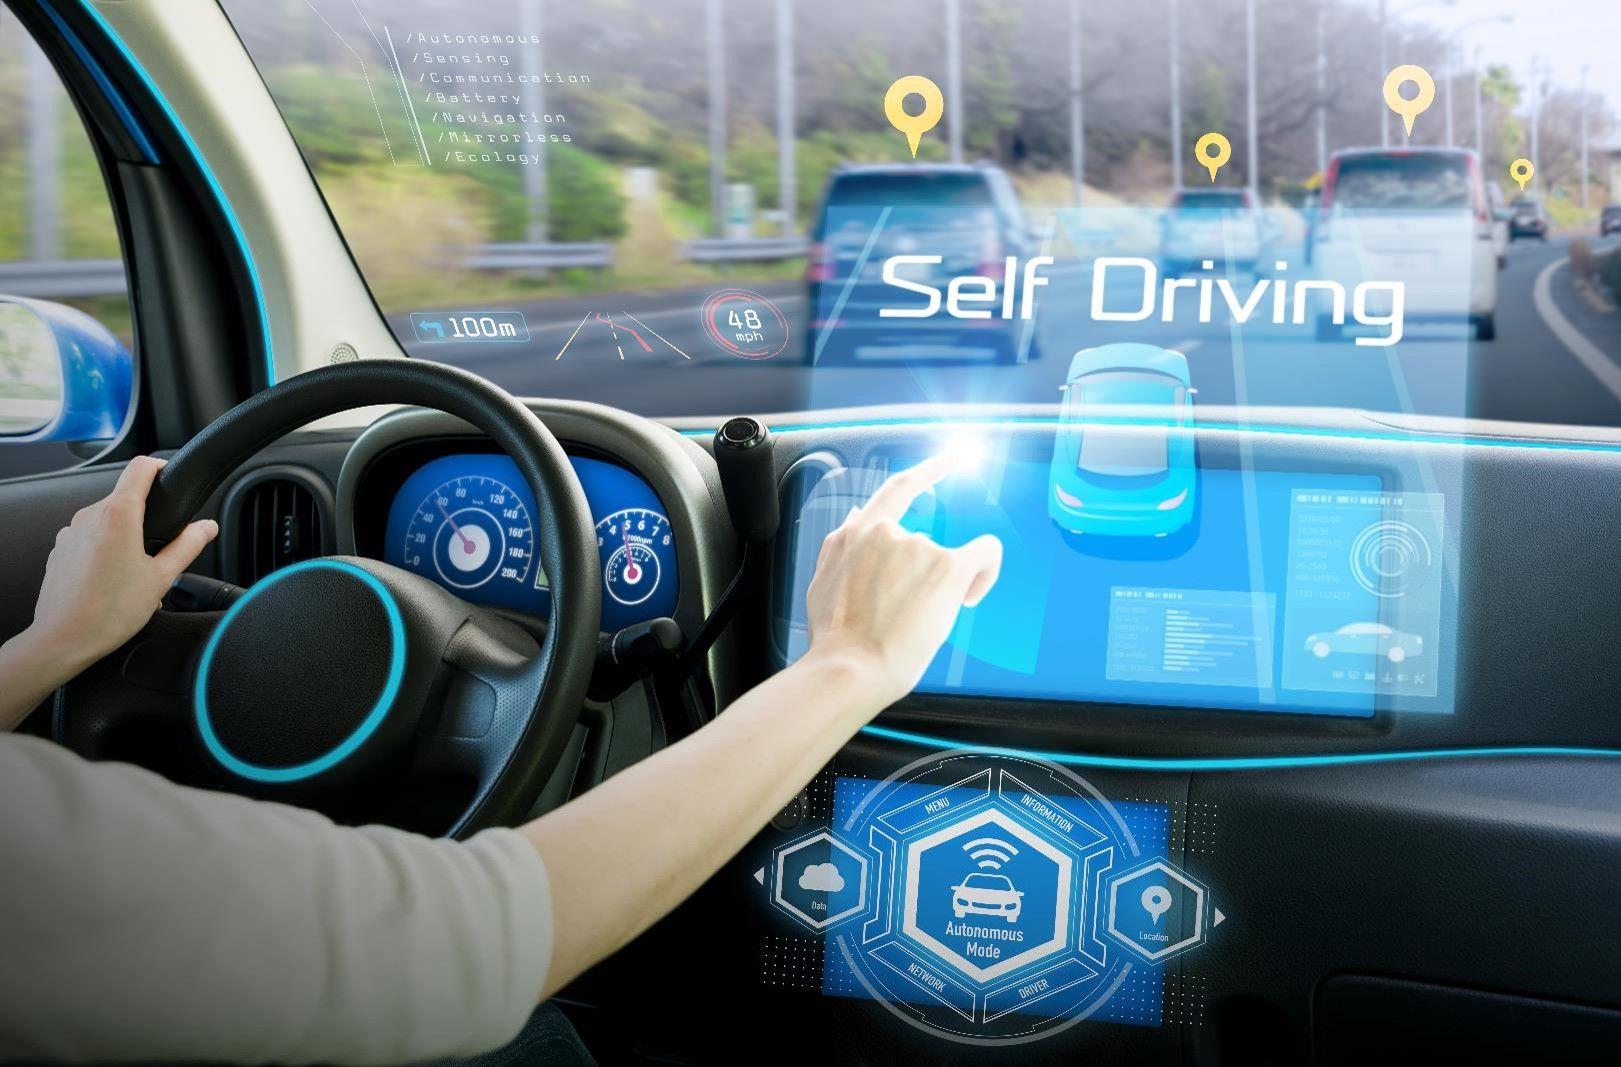 #AutonomousVehicles #SelfDrivingCars #DriverlessCars #SelfDrivingVehicles #PioneeringMinds